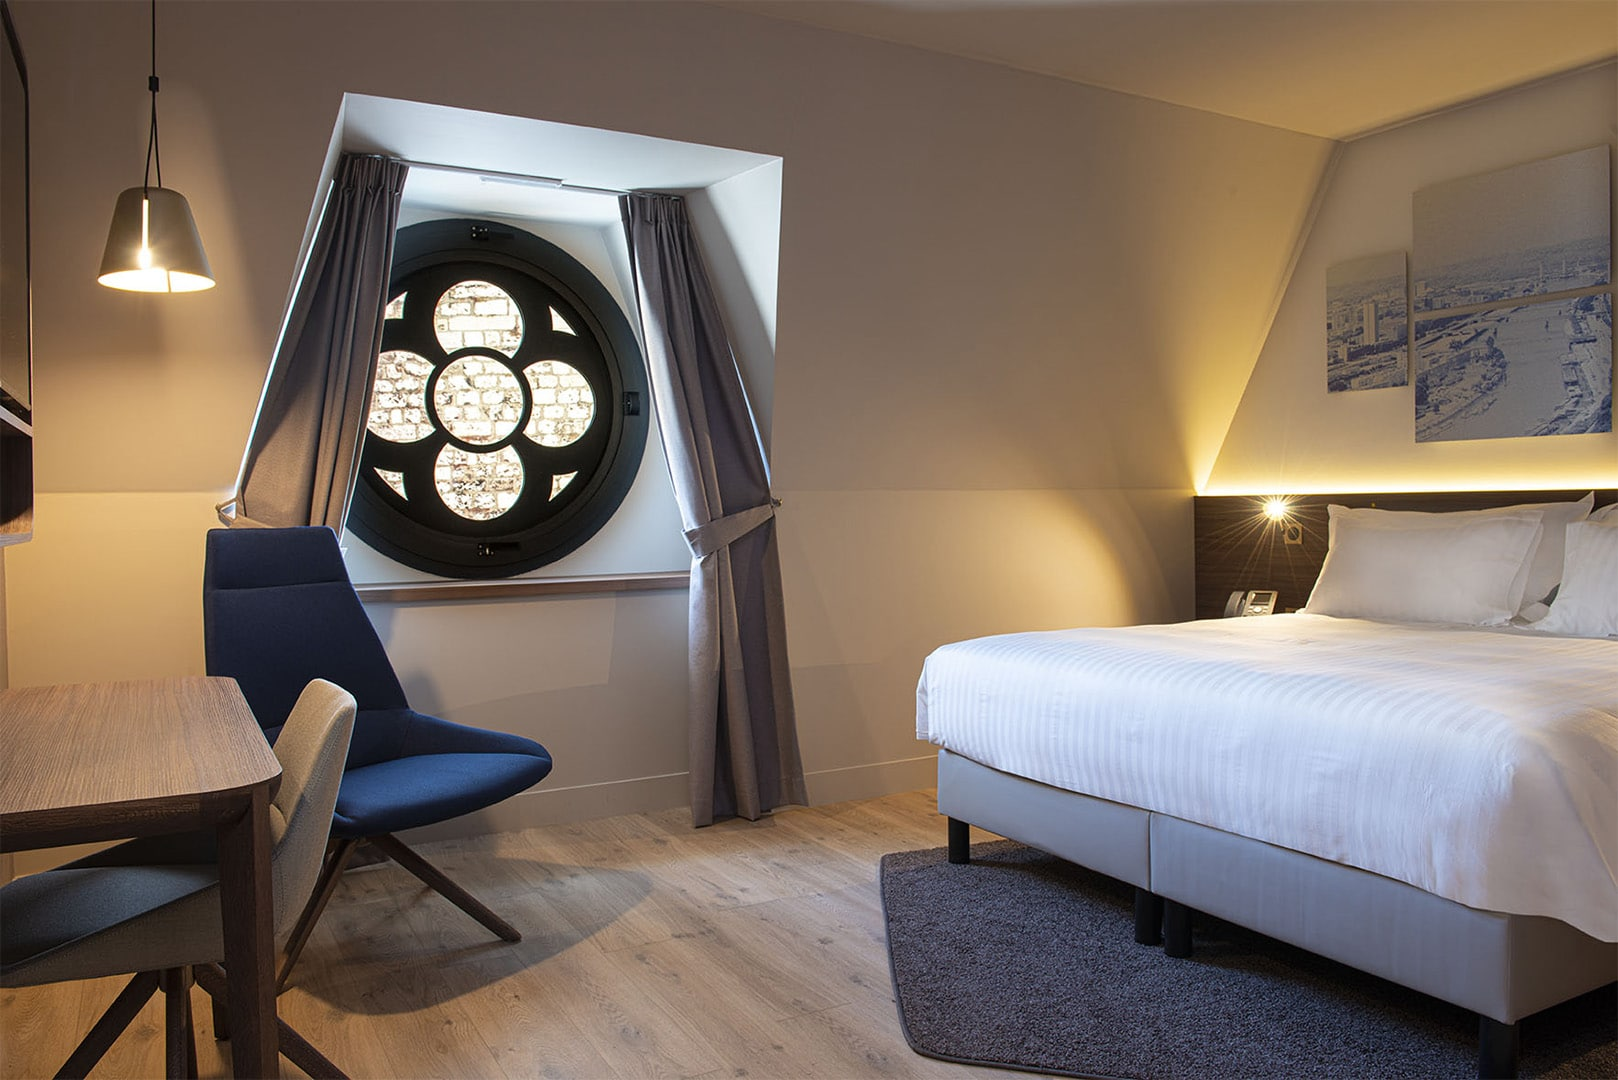 hotel-du-donjon-cba-rouen-francisvauban-9